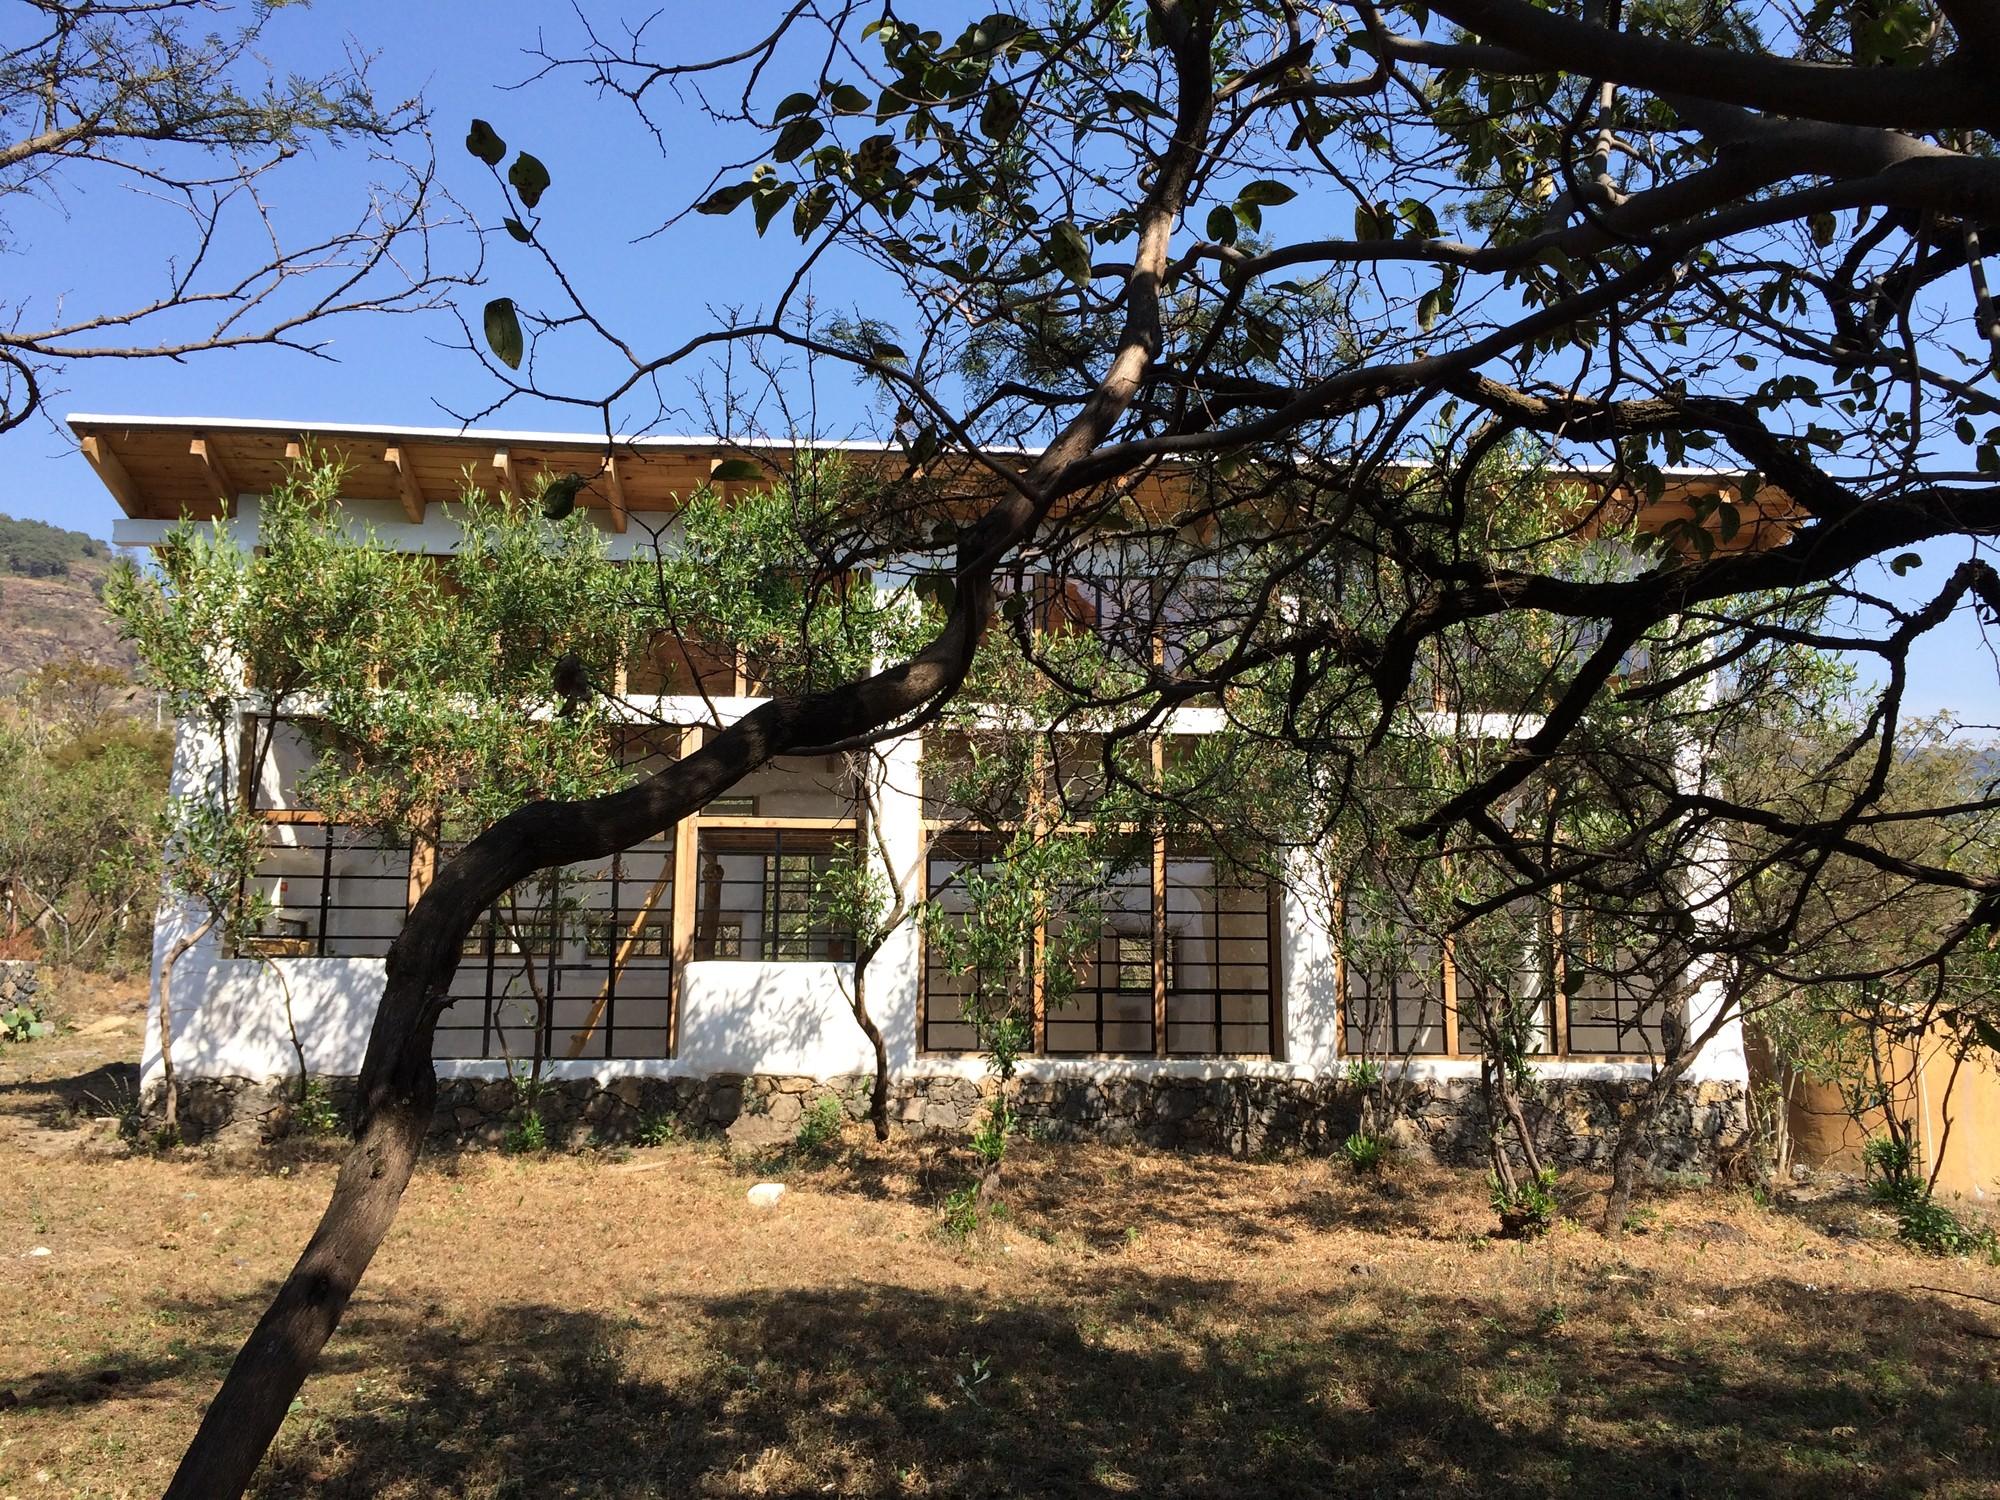 Proyecto Casa en Tepoztlán / Cortesía de LABMx